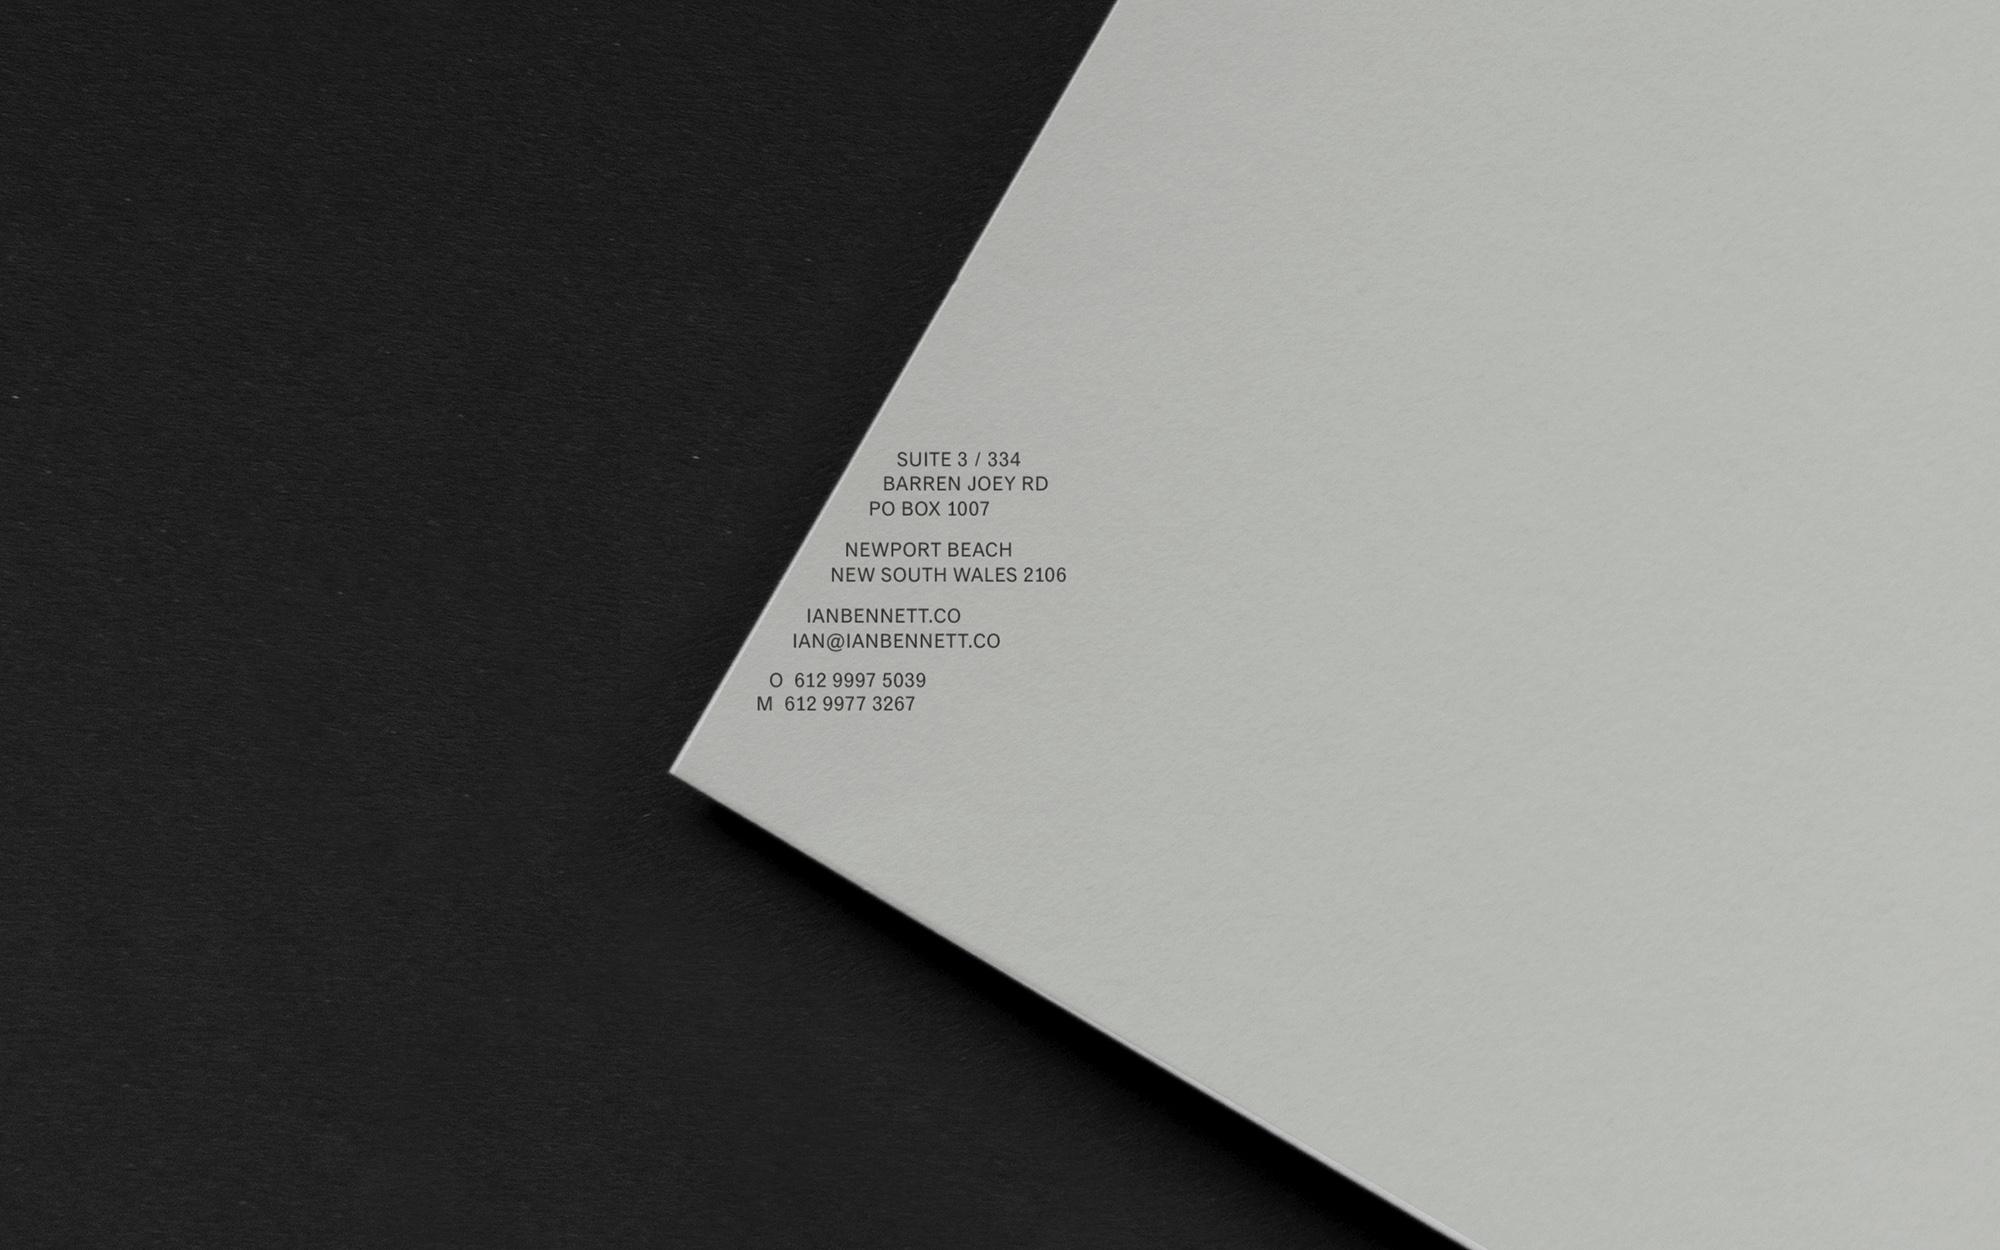 Studio Otherness Create Branding for Ian Bennett Architectural Practice